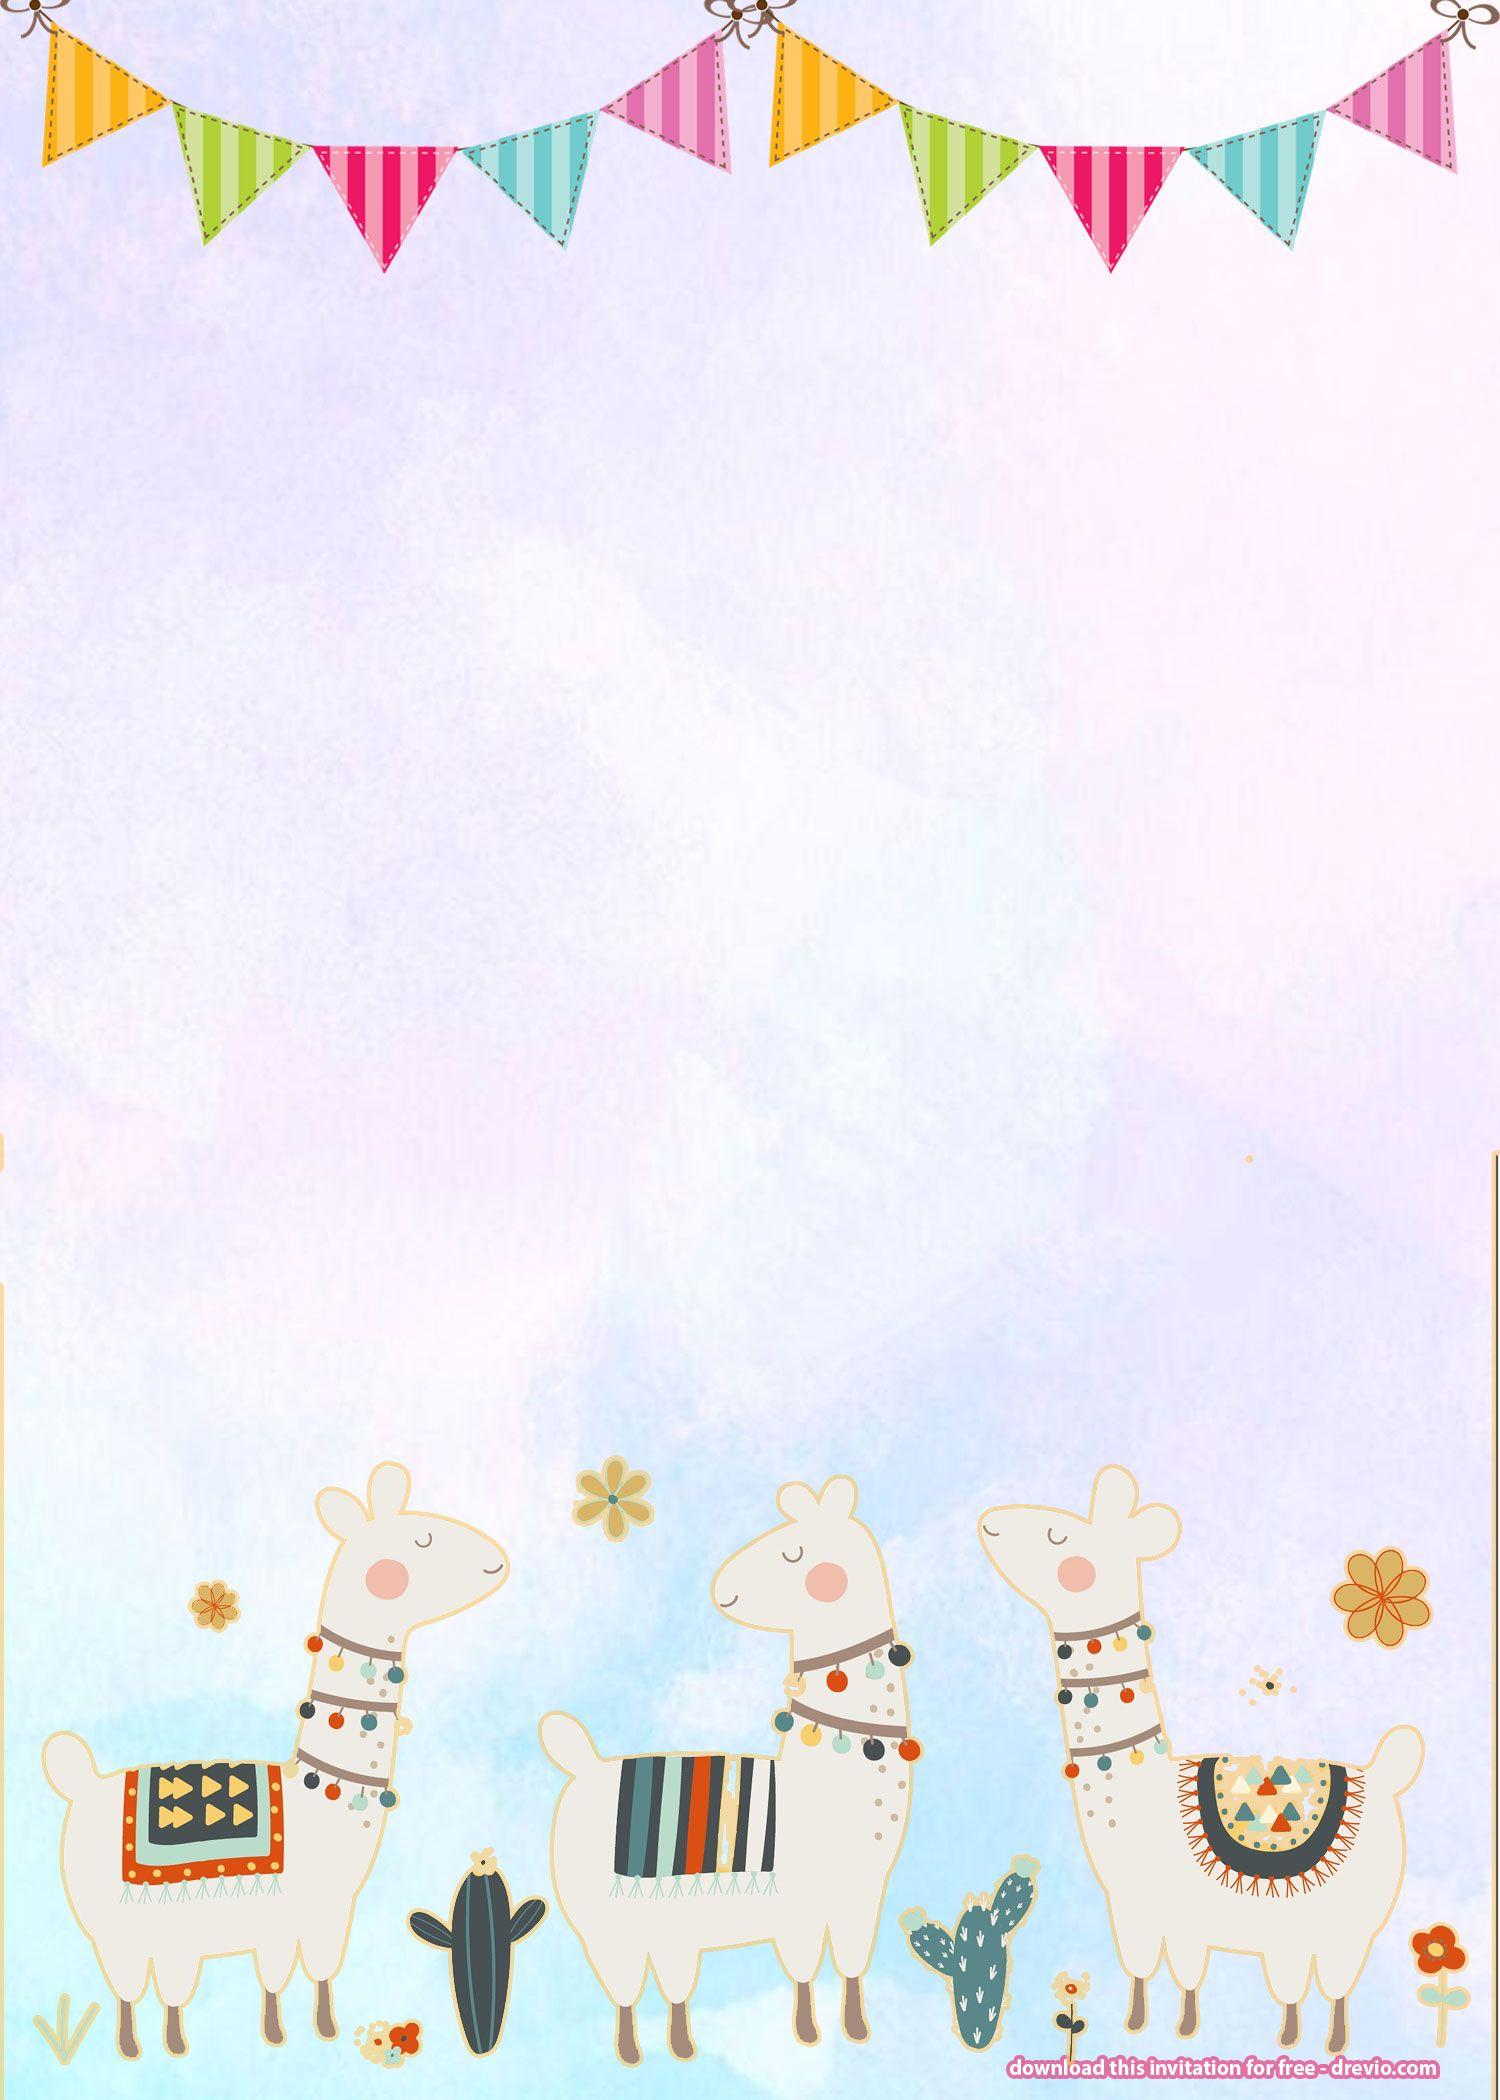 Free Llama Birthday Invitation | Free Printable Birthday - Free Printable Birthday Invitations Pinterest